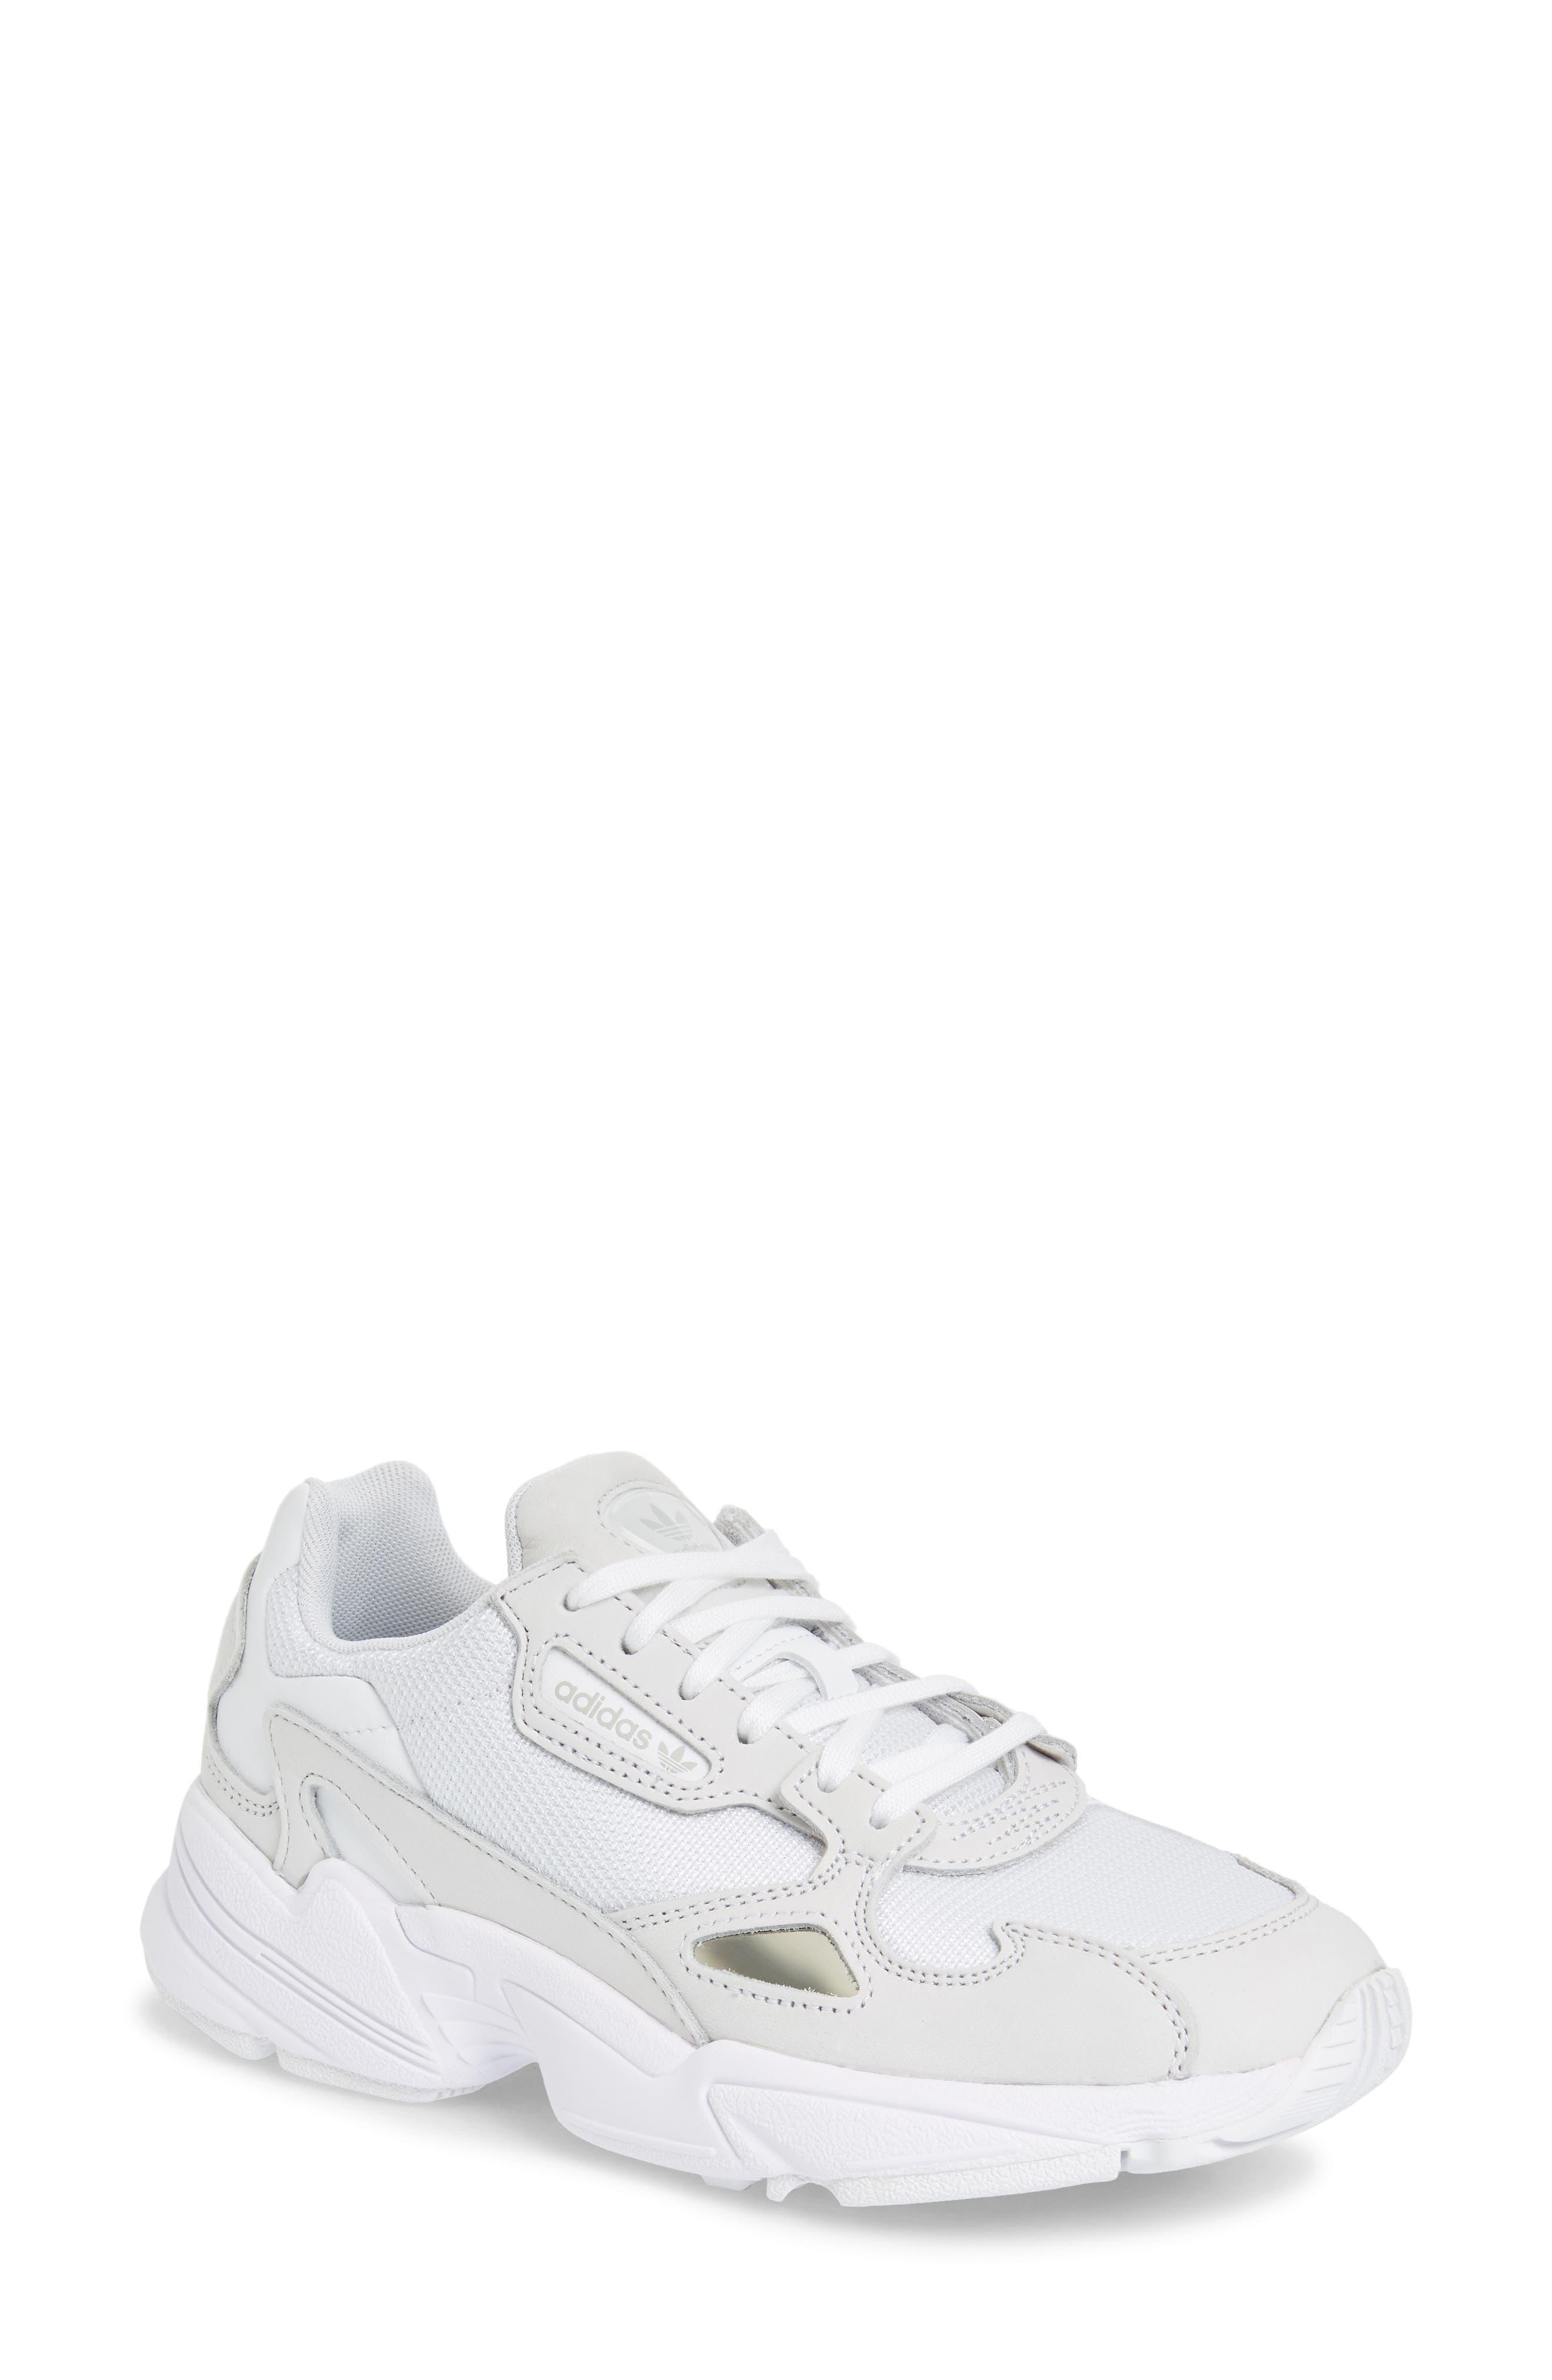 Falcon Sneaker,                             Main thumbnail 1, color,                             WHITE